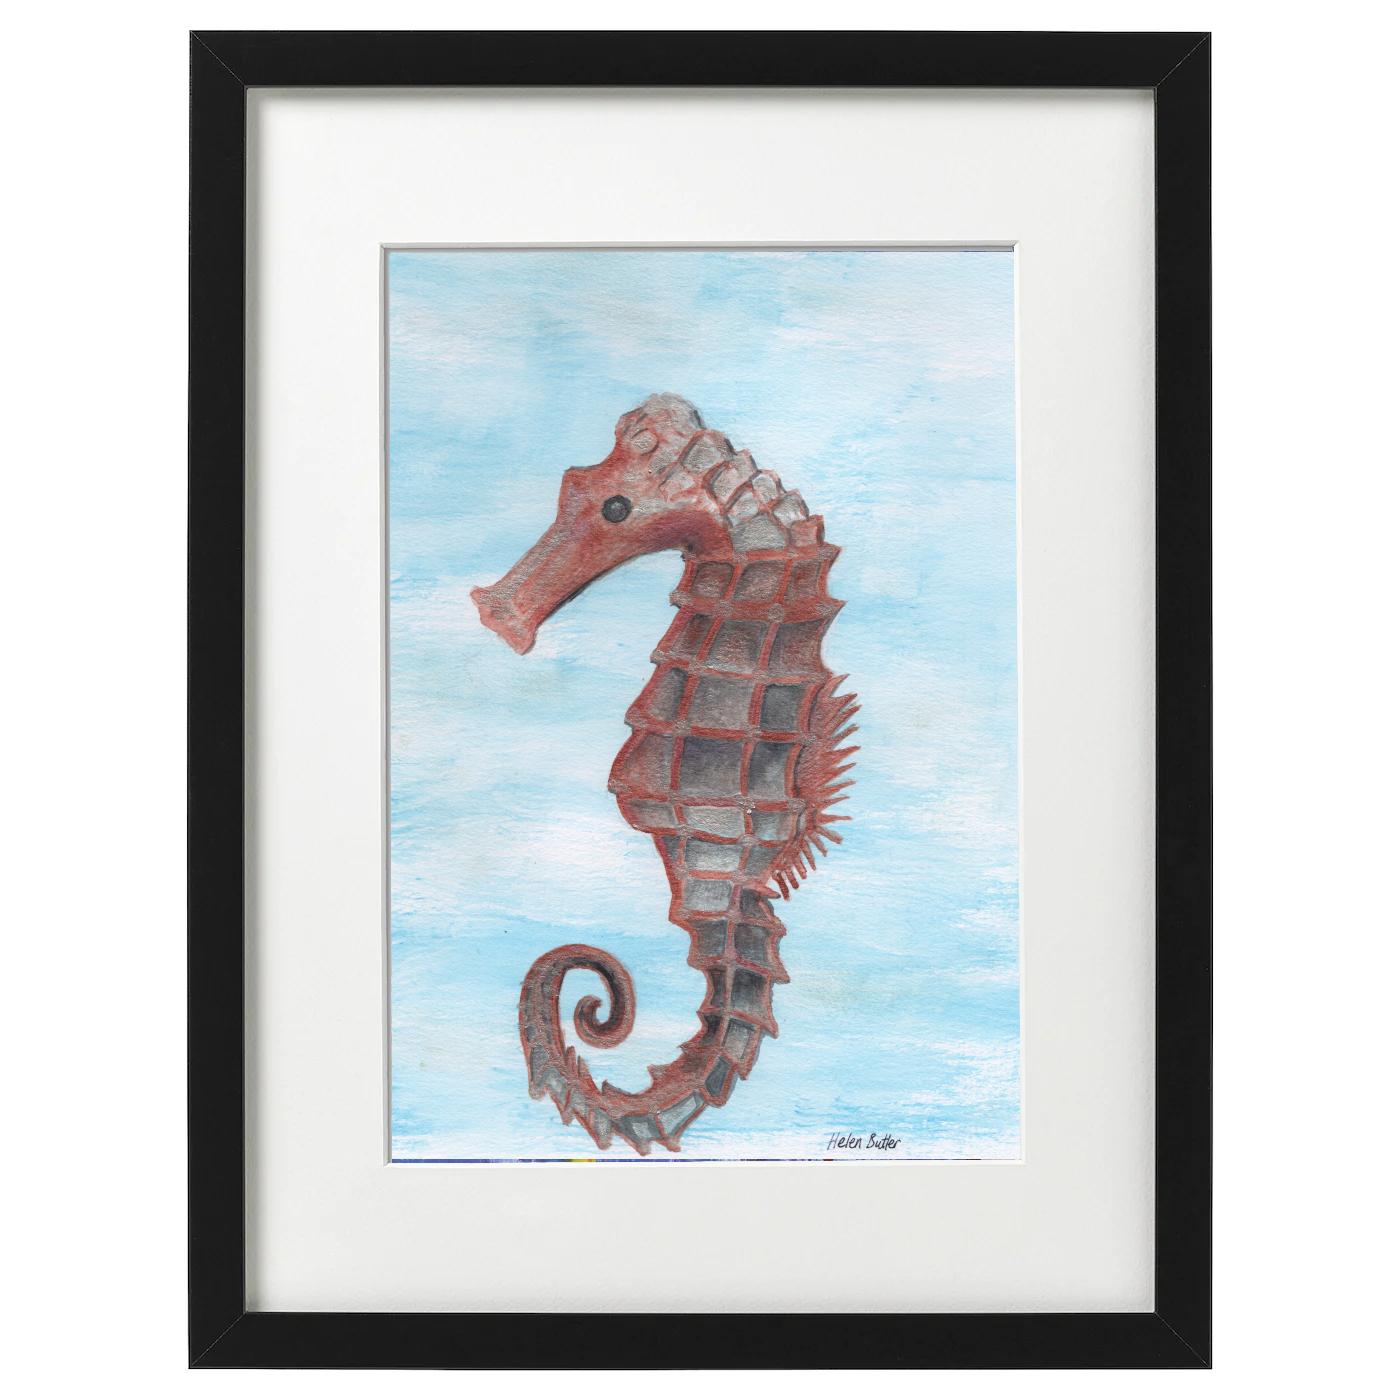 Seahorse - metallic watercolour